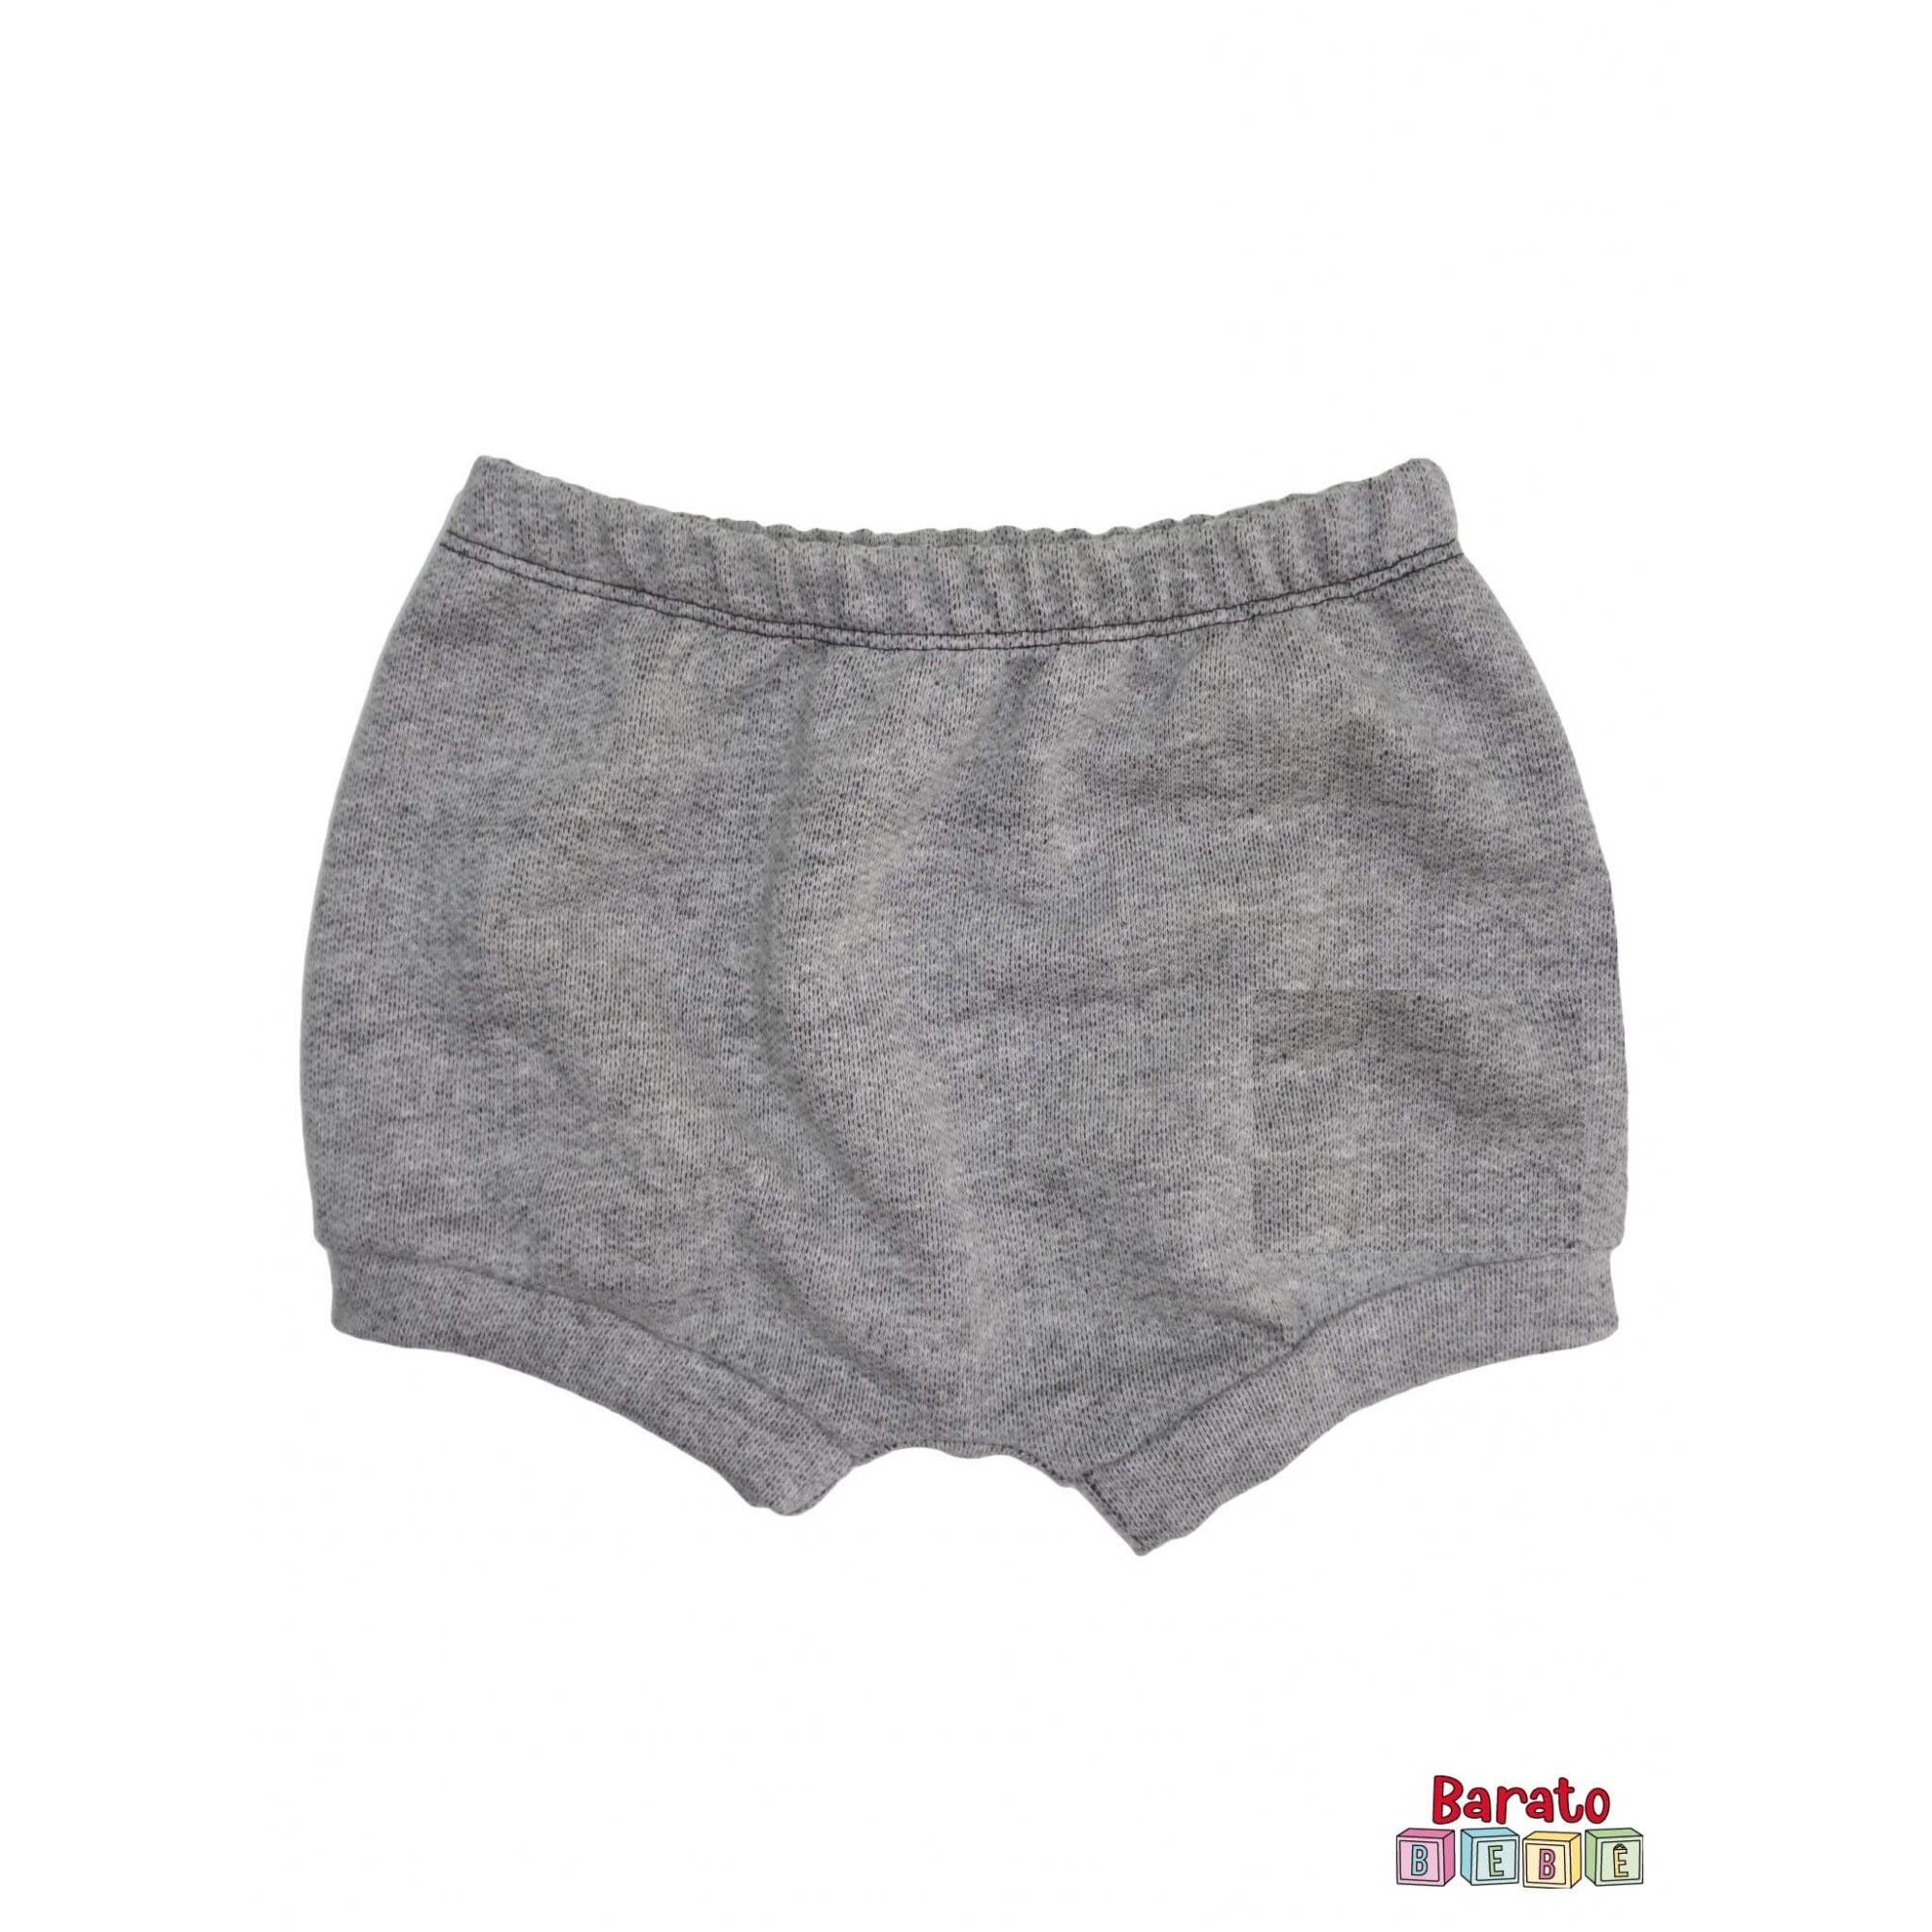 Shorts(Tapa Fralda) Bebê(P/M/G)  - Barato Bebê - Mescla Preto